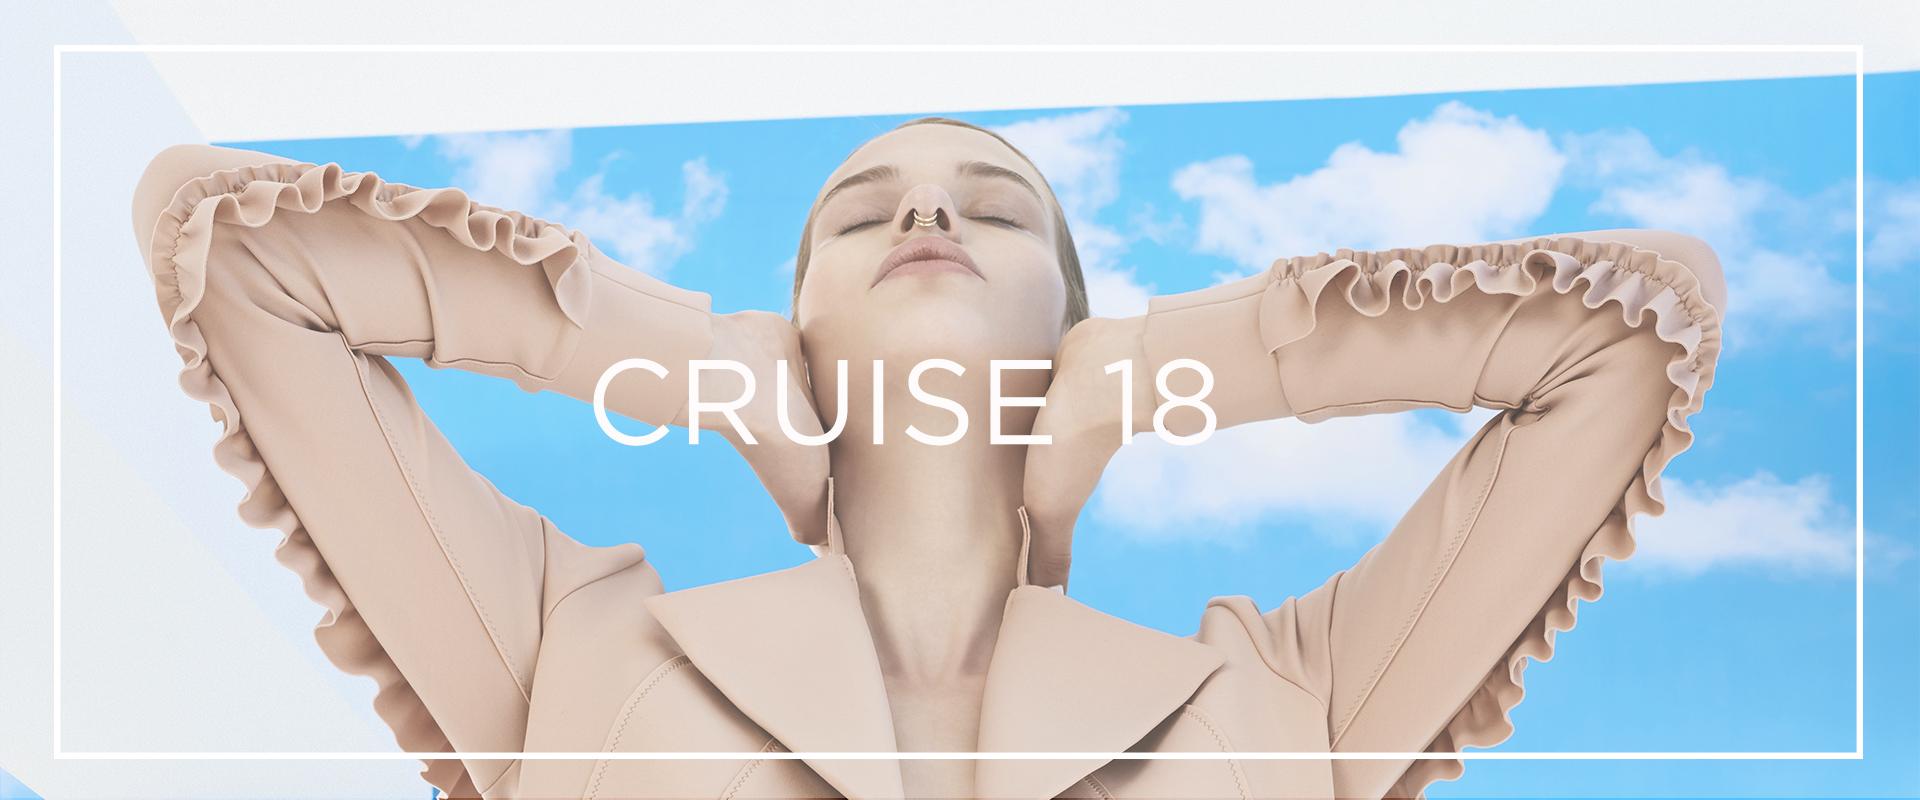 cruise 18